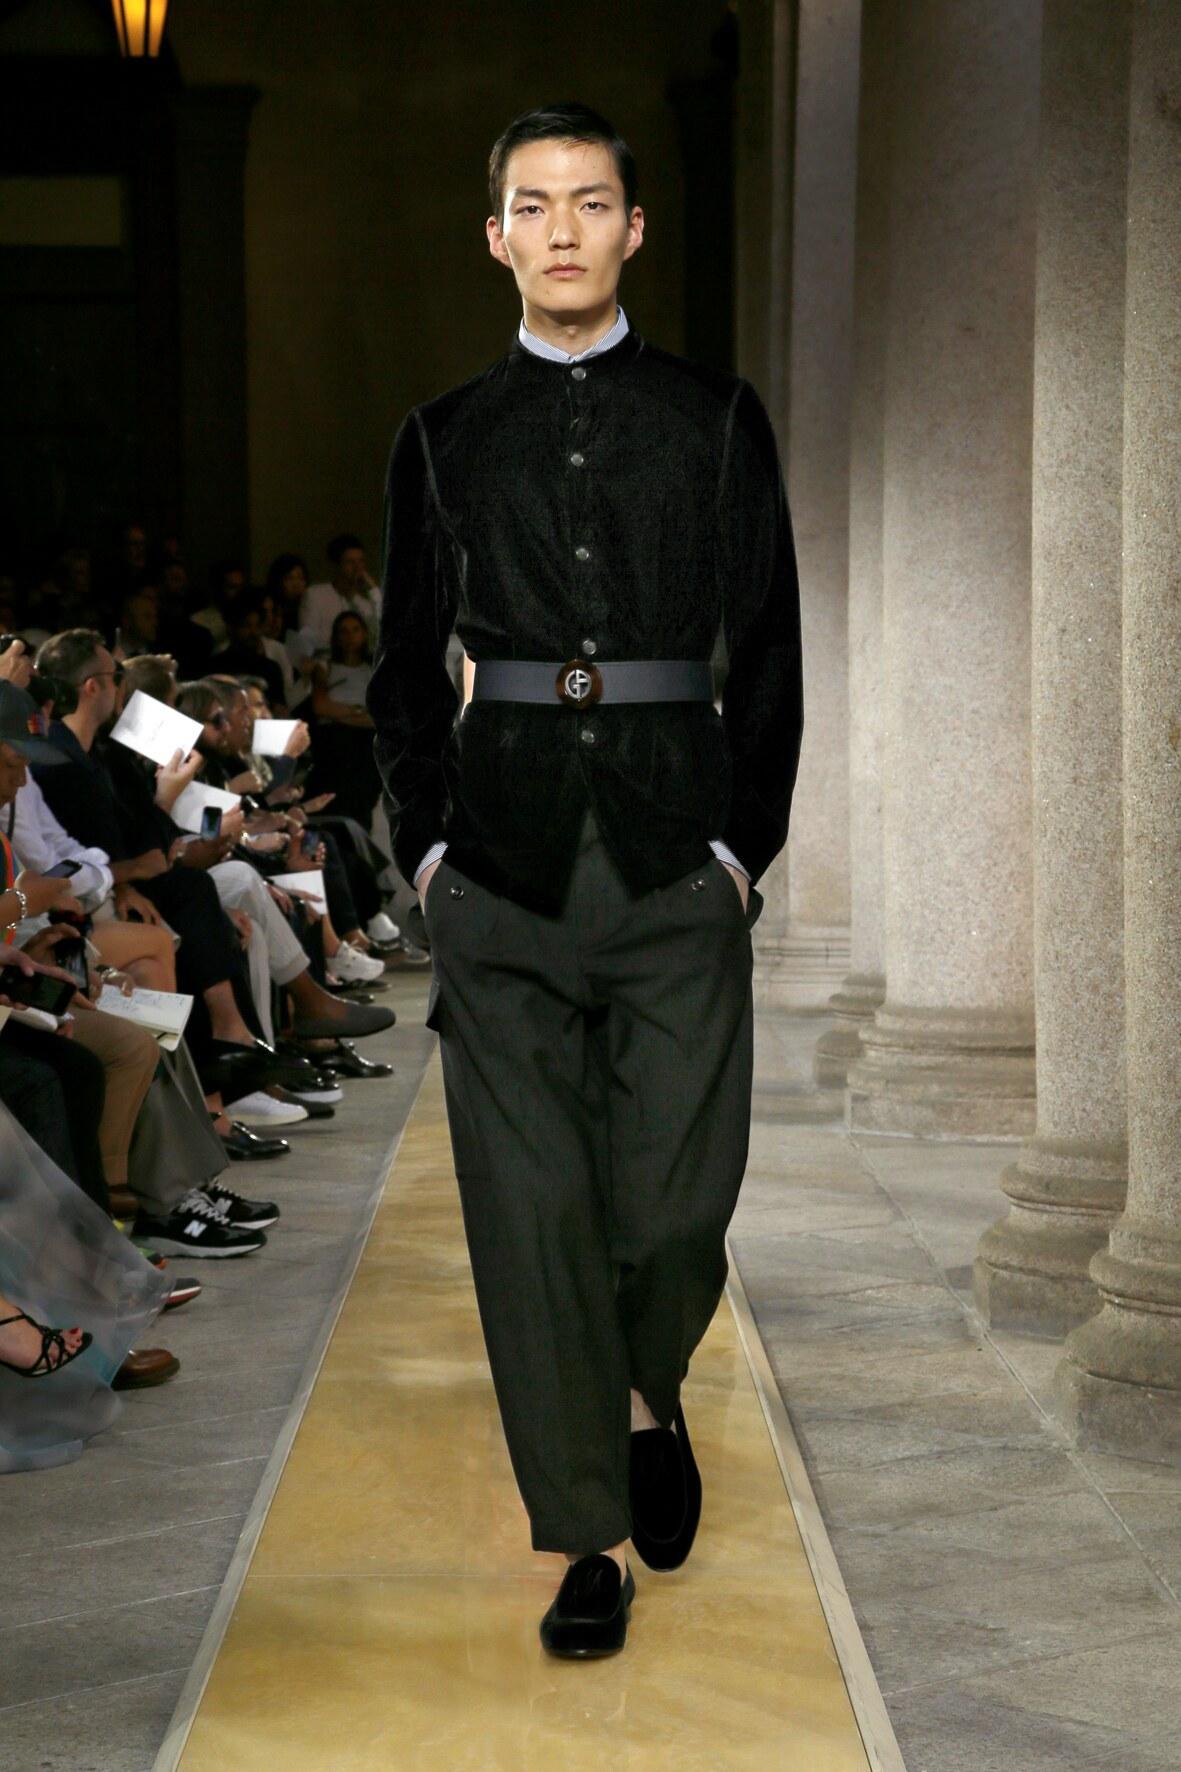 2020 Giorgio Armani Trends Milan Fashion Show